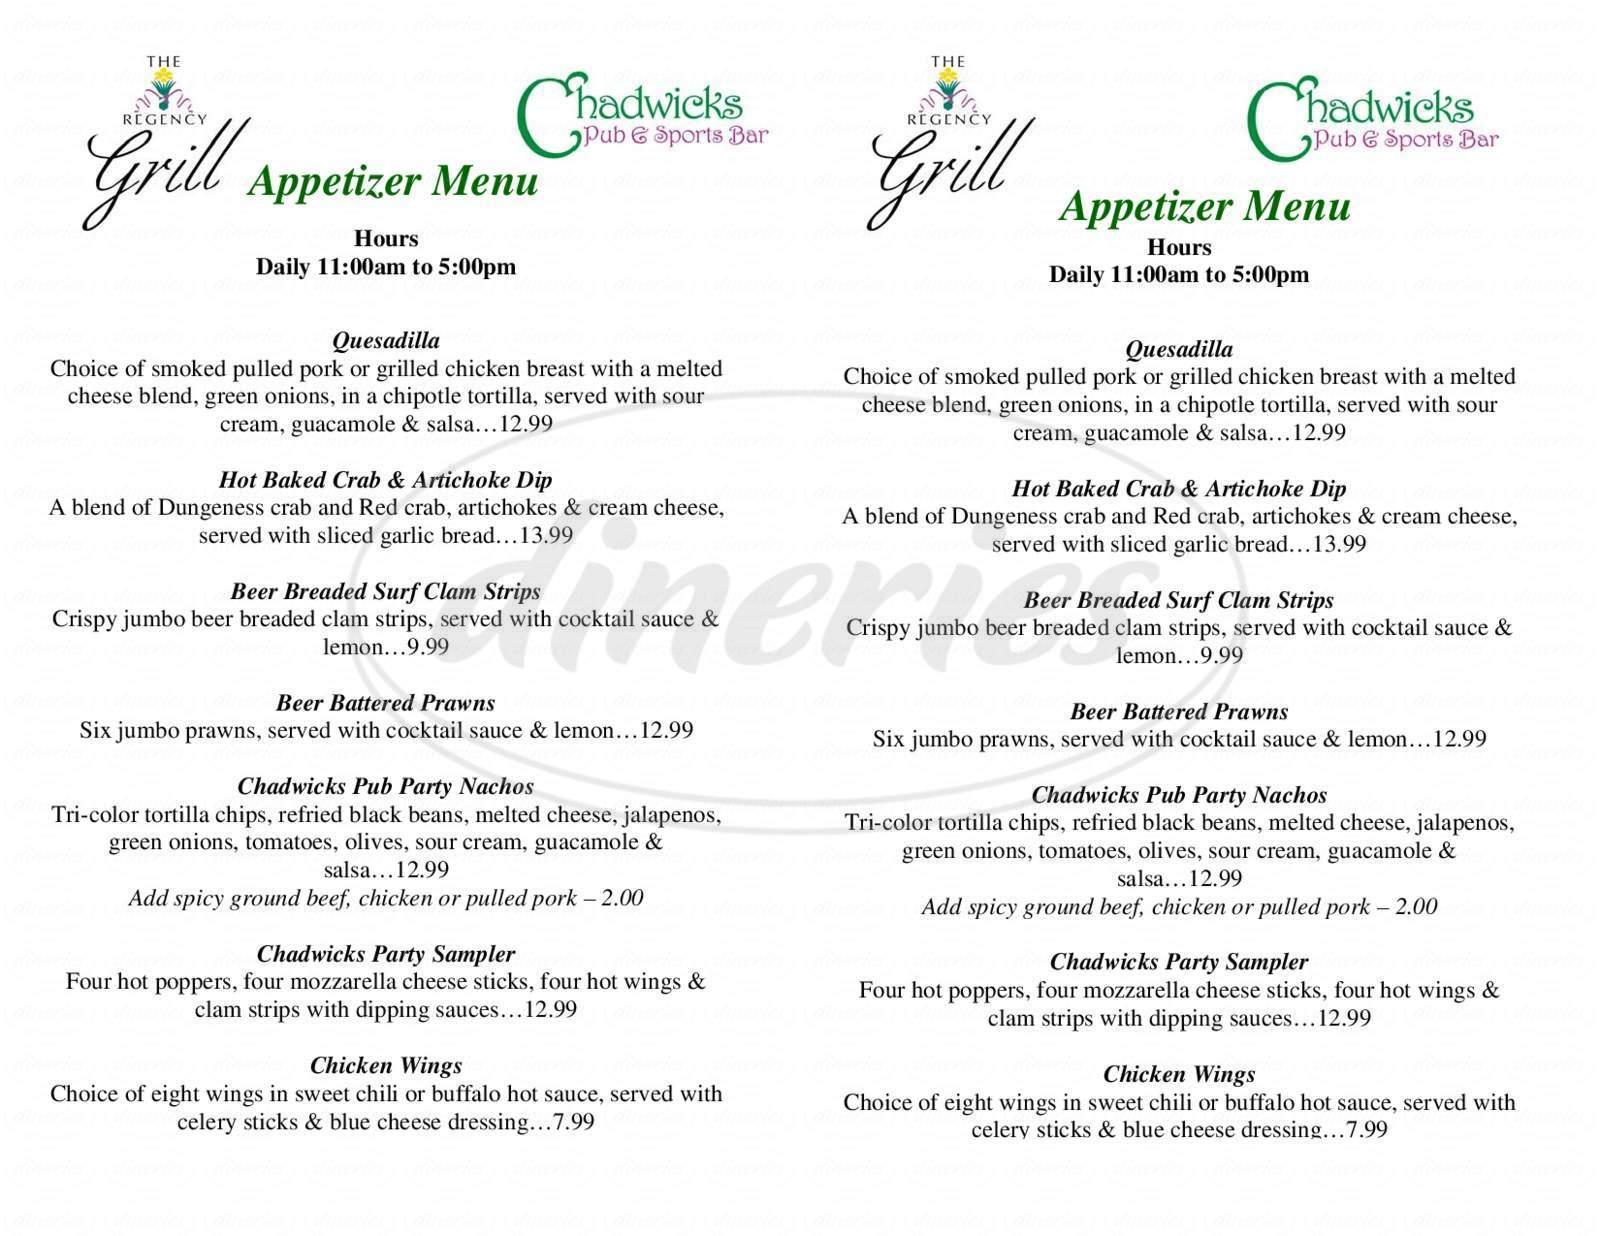 menu for The Regency Grill